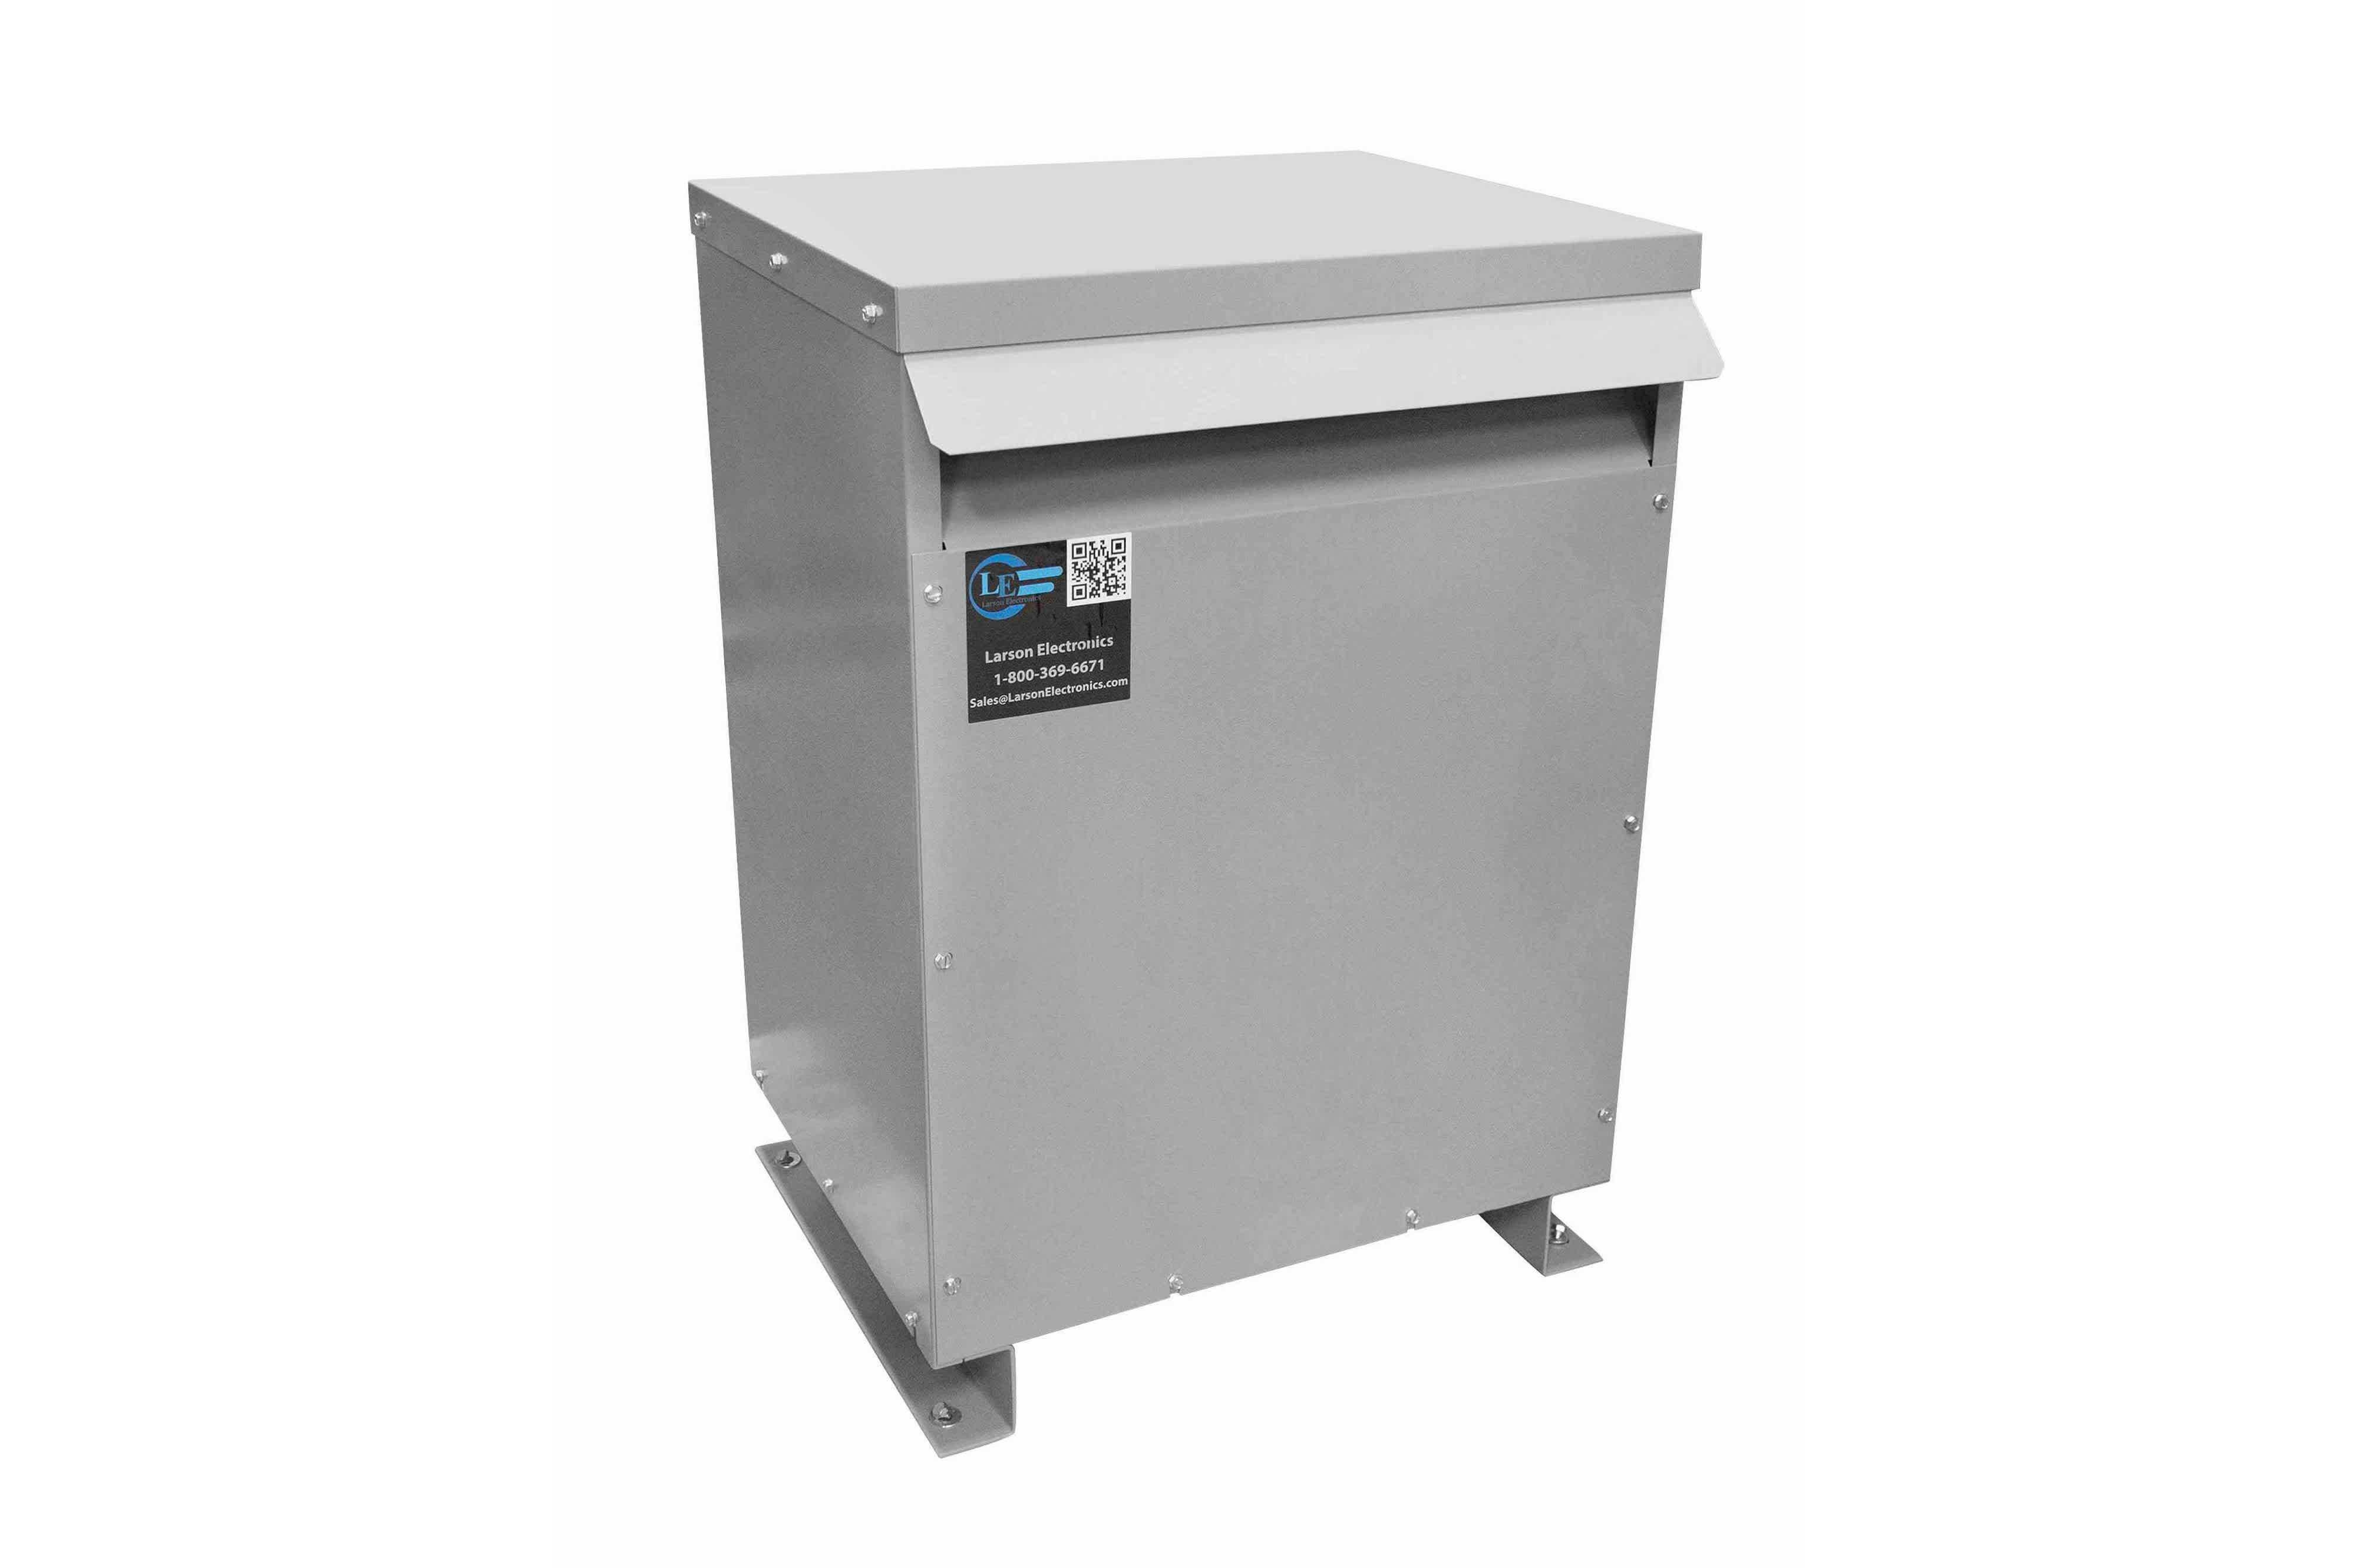 600 kVA 3PH Isolation Transformer, 415V Wye Primary, 208Y/120 Wye-N Secondary, N3R, Ventilated, 60 Hz